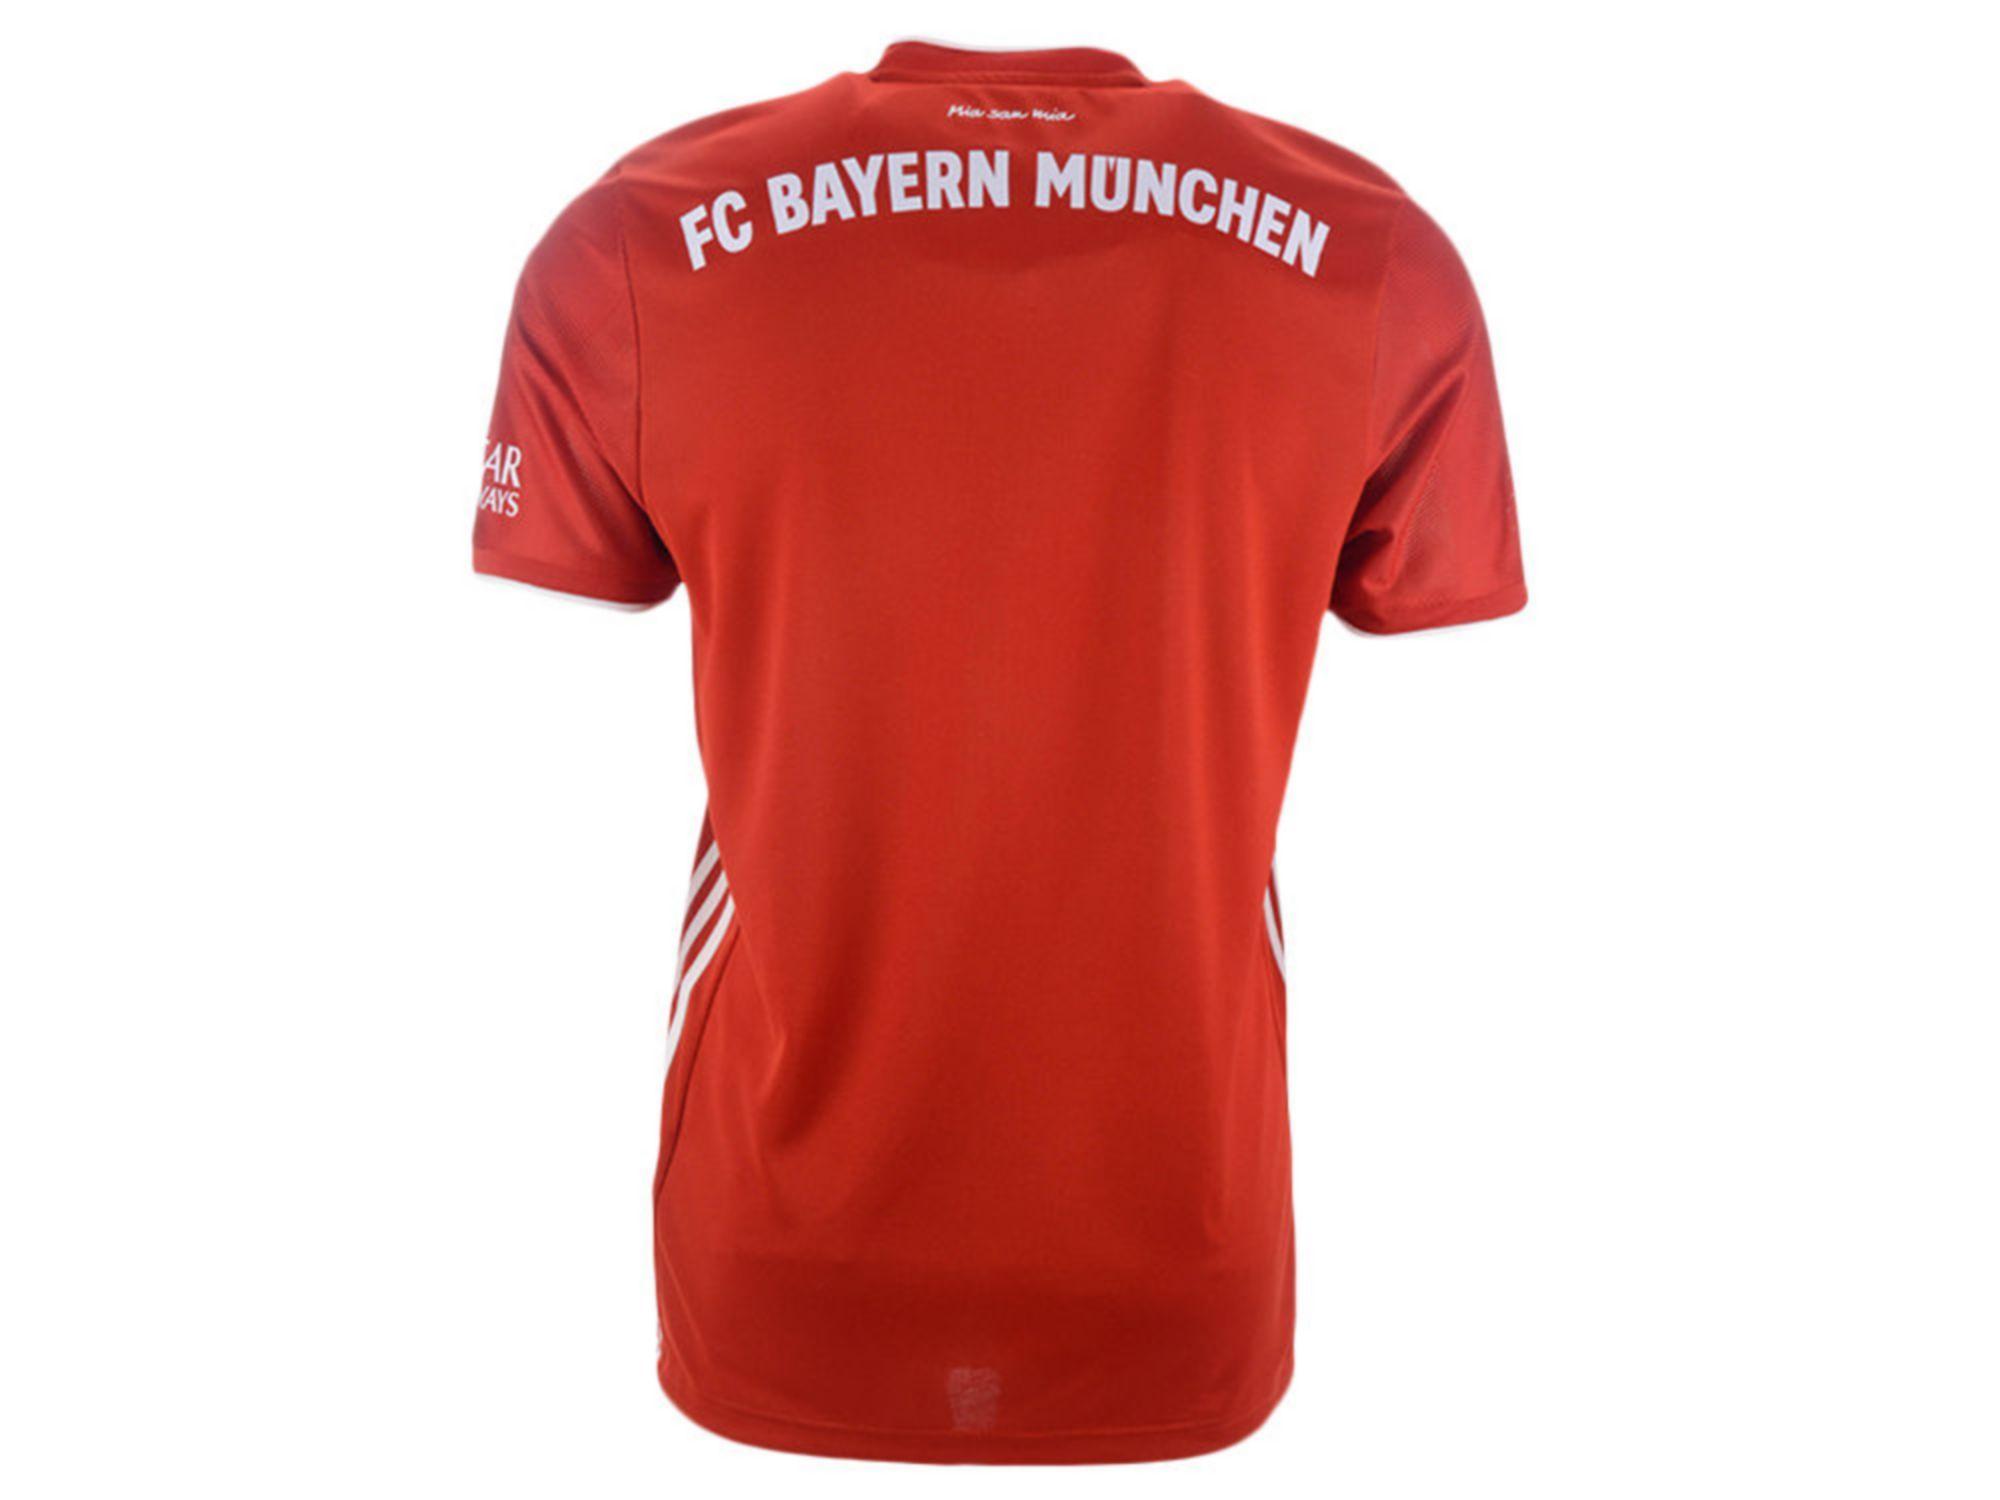 Adidas Bayern Munich Men's Home Stadium Jersey & Reviews - Sports Fan Shop By Lids - Men - Macy's